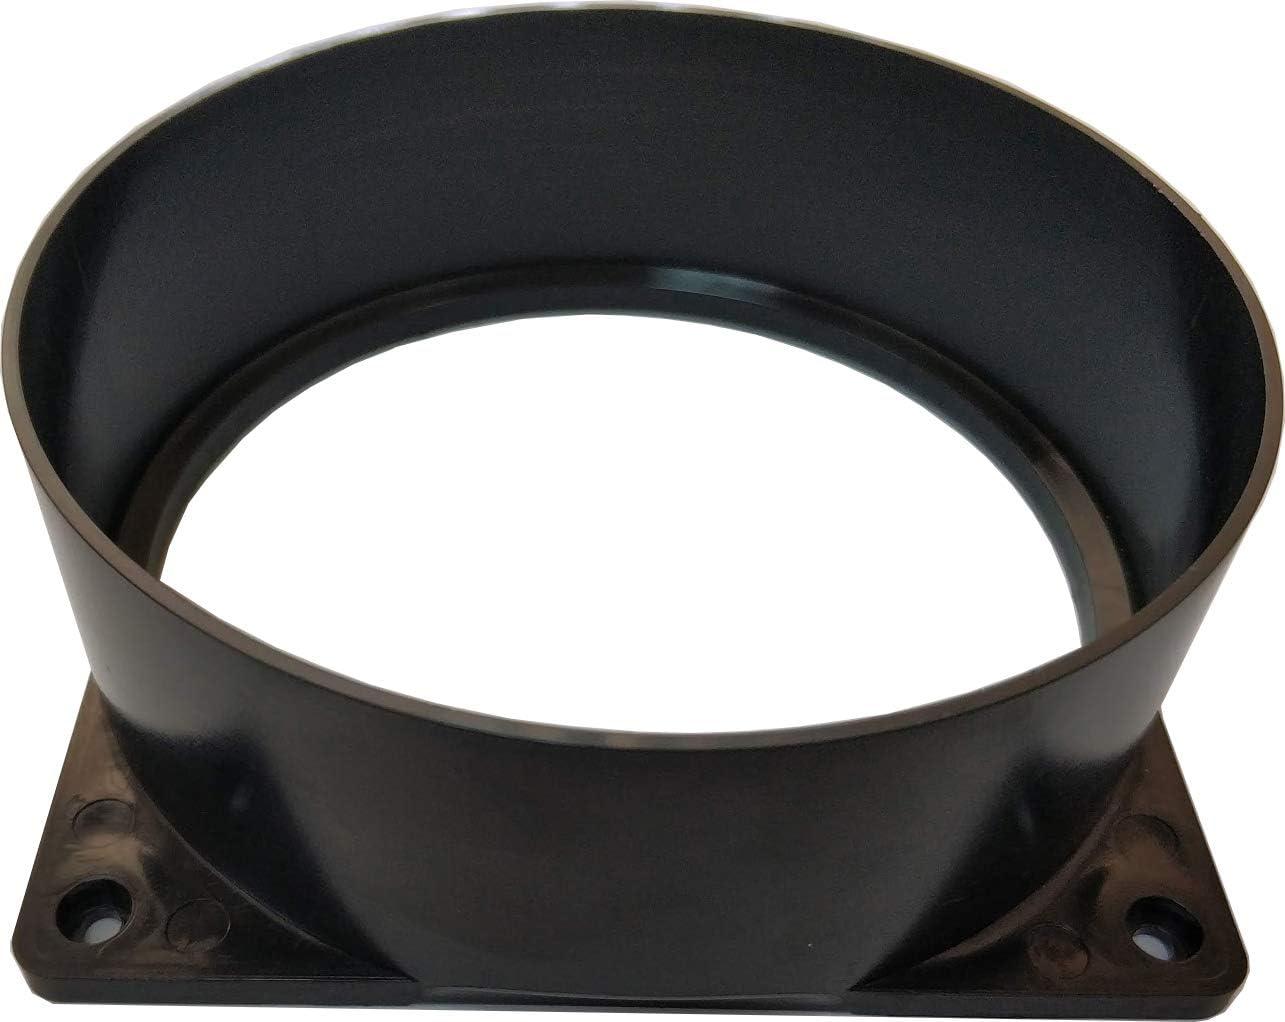 Antminer T9 S1 S3 S5 S7 S9 A3 D3 L3 V9 120mm High Temp Fan Duct 5 INCH USA made